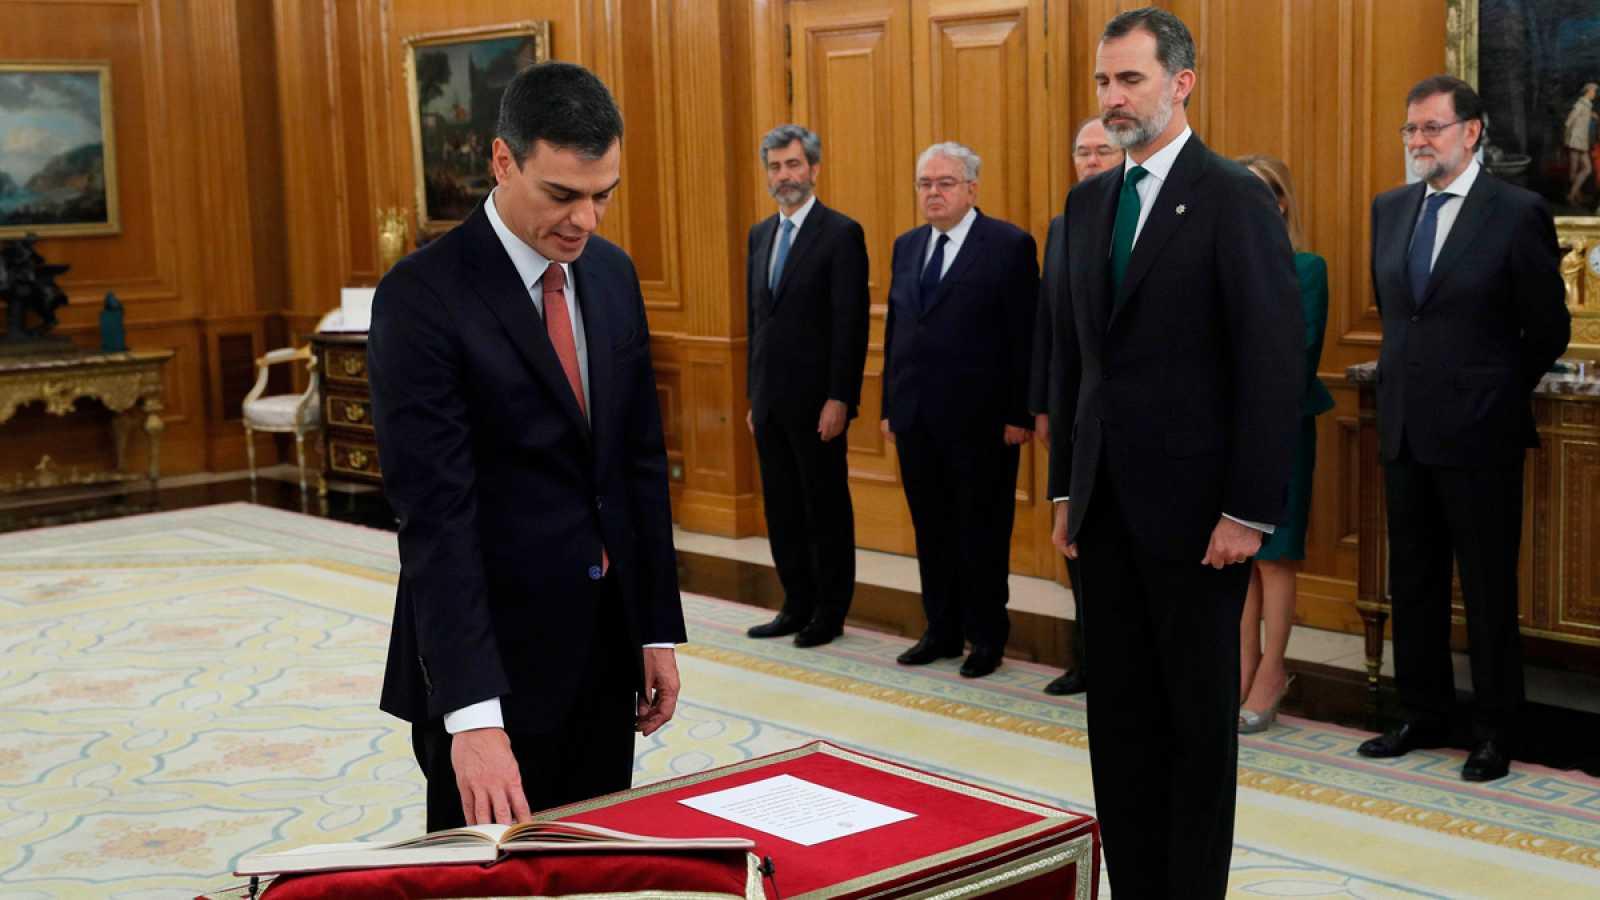 Pedro Sánchez, primer presidente que promete su cargo sin crucifijo ni Biblia